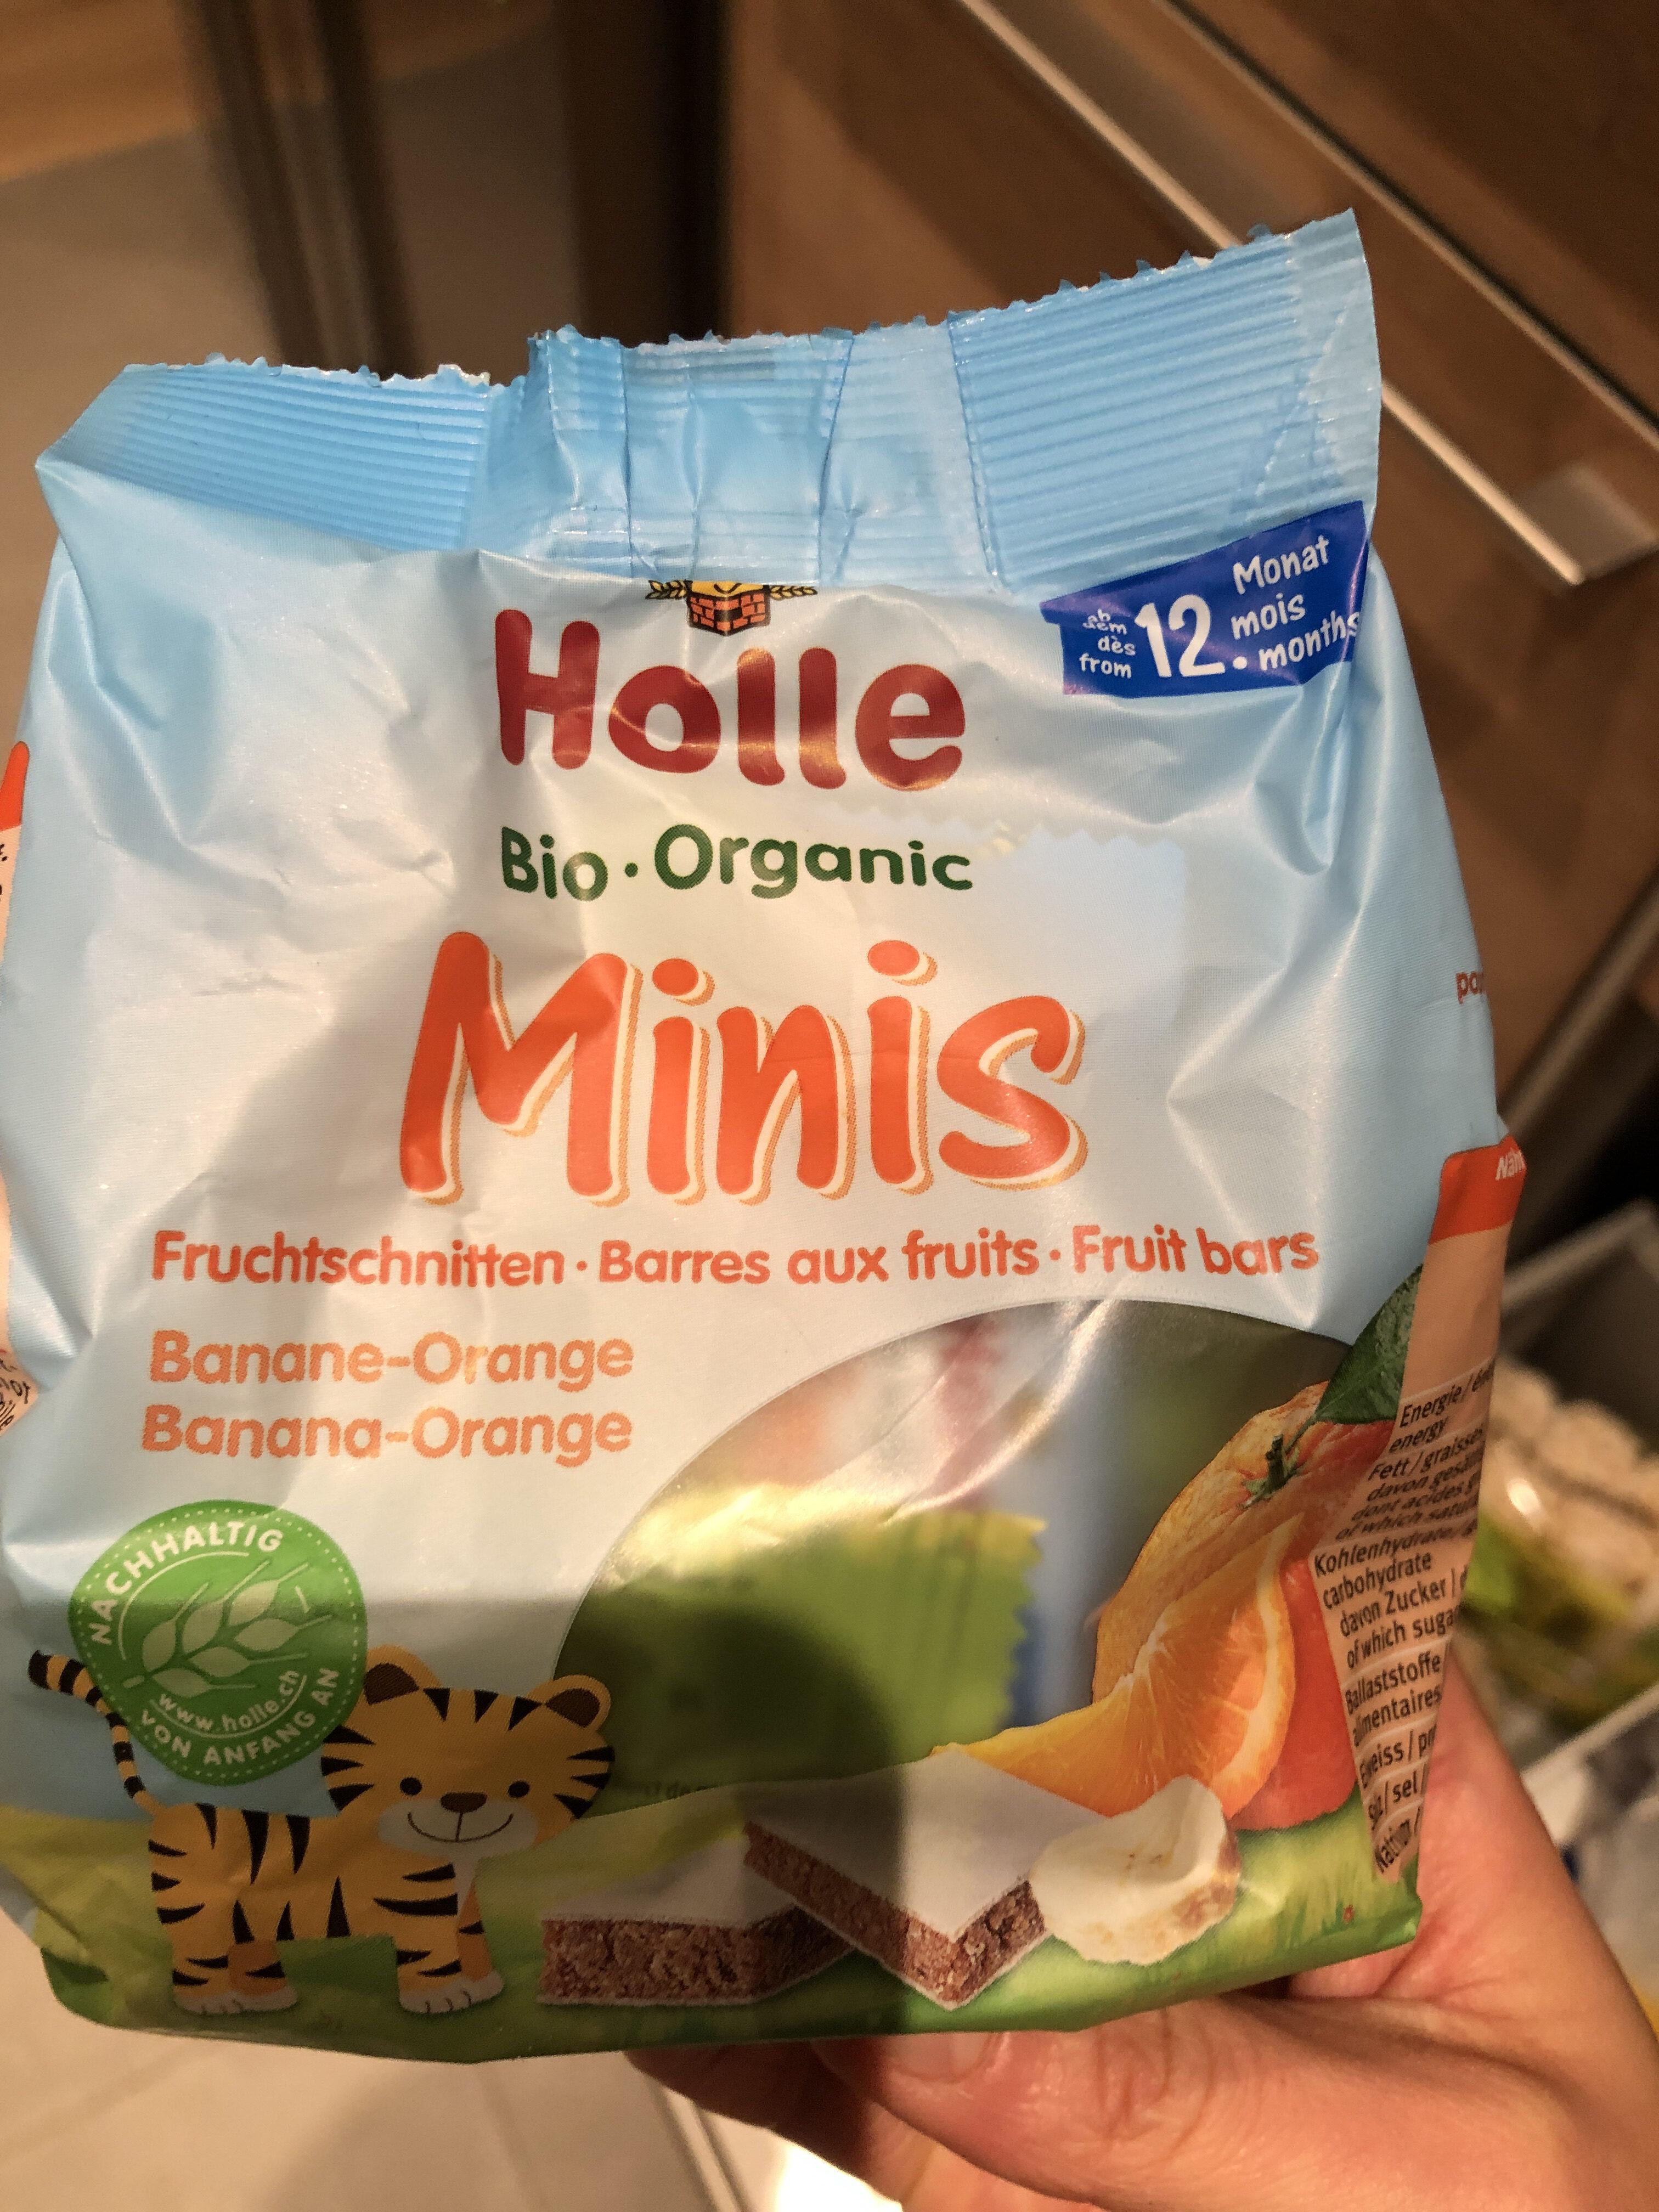 Holle Minis Fruchtschnitten Banane Orange, 8X 12,5 GR Packung - Product